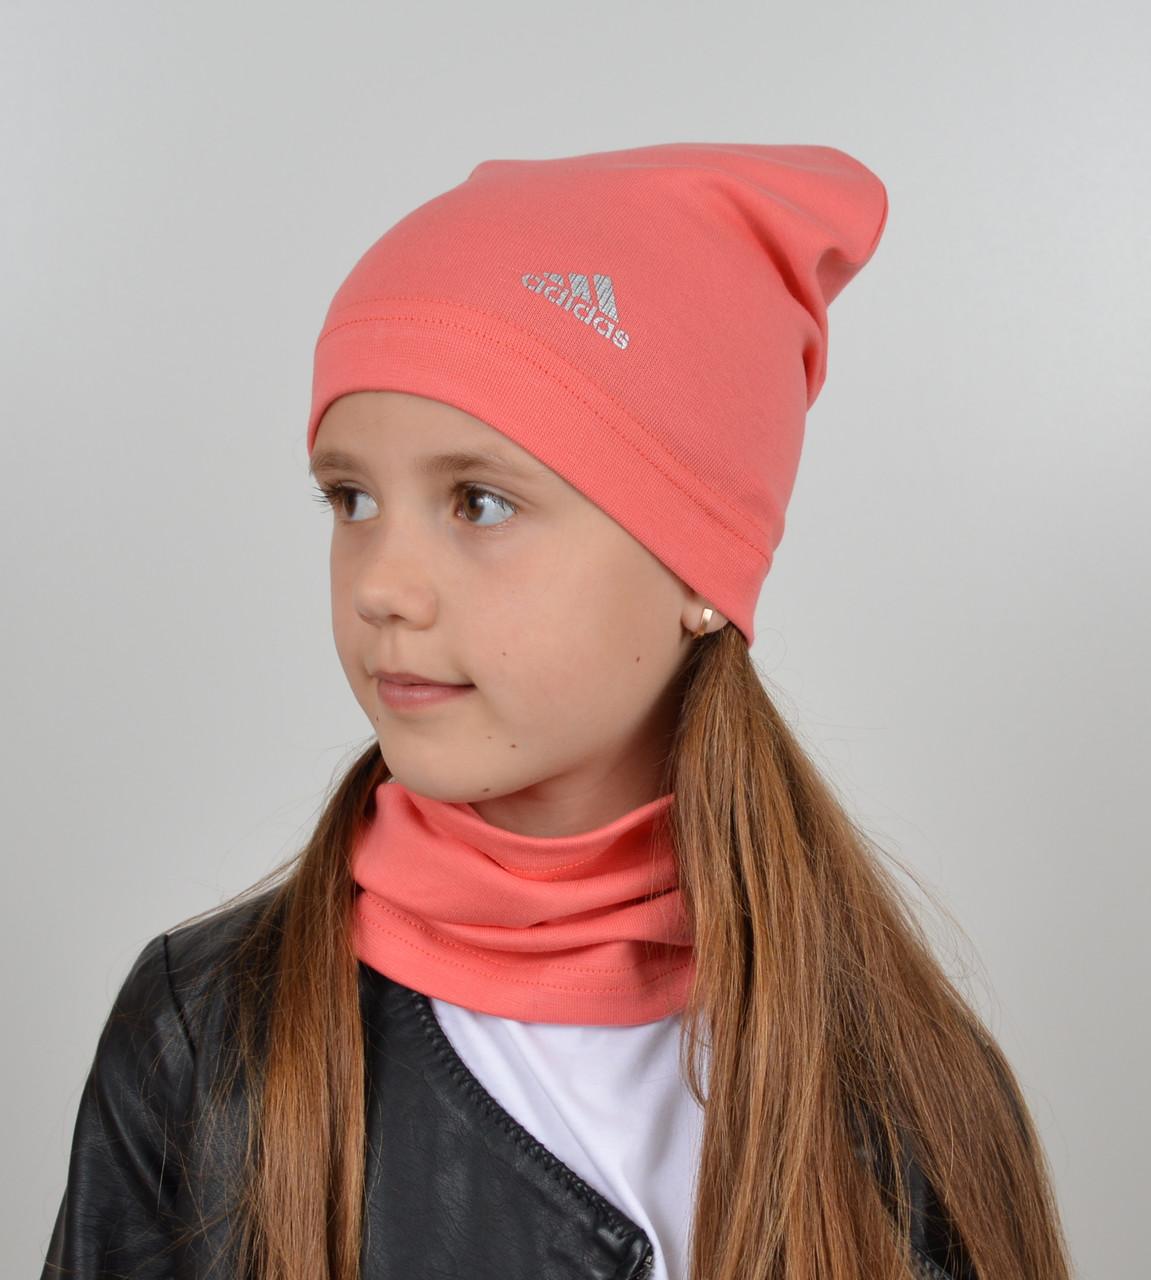 Дитячий трикотажний комплект оптом (шапка+хомут)